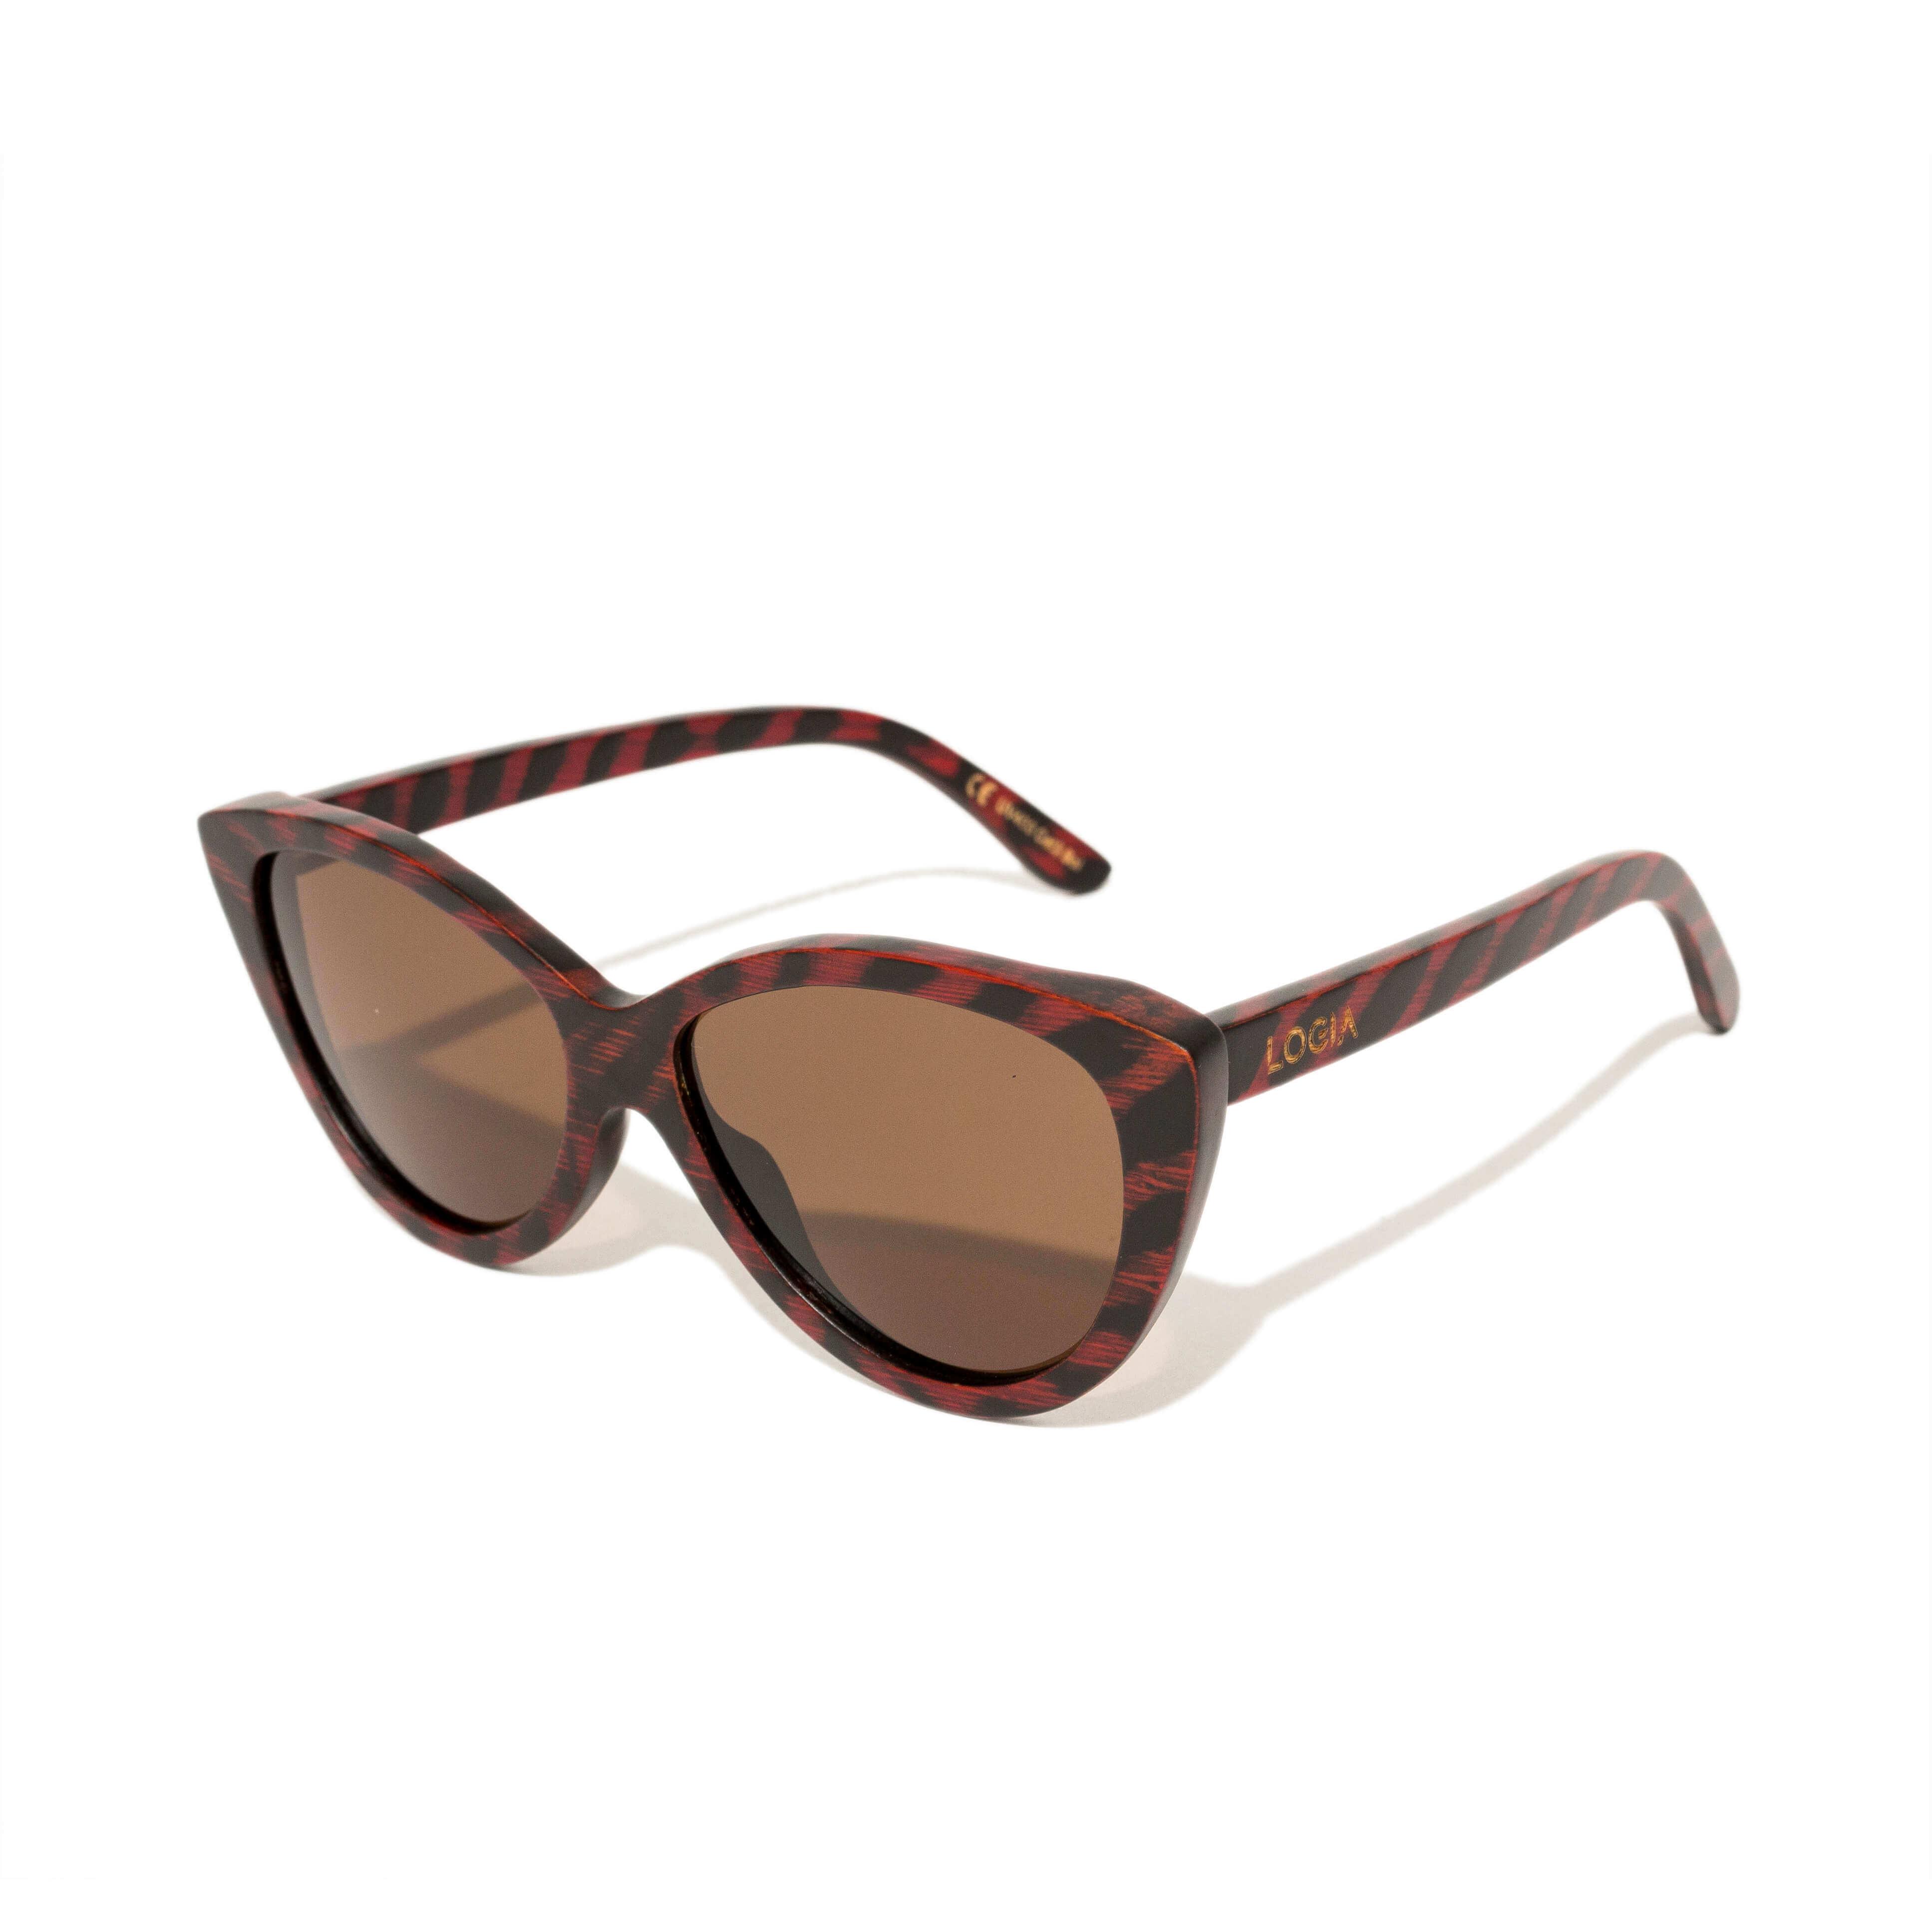 Sunglasses Logia Lifestyle Tiger